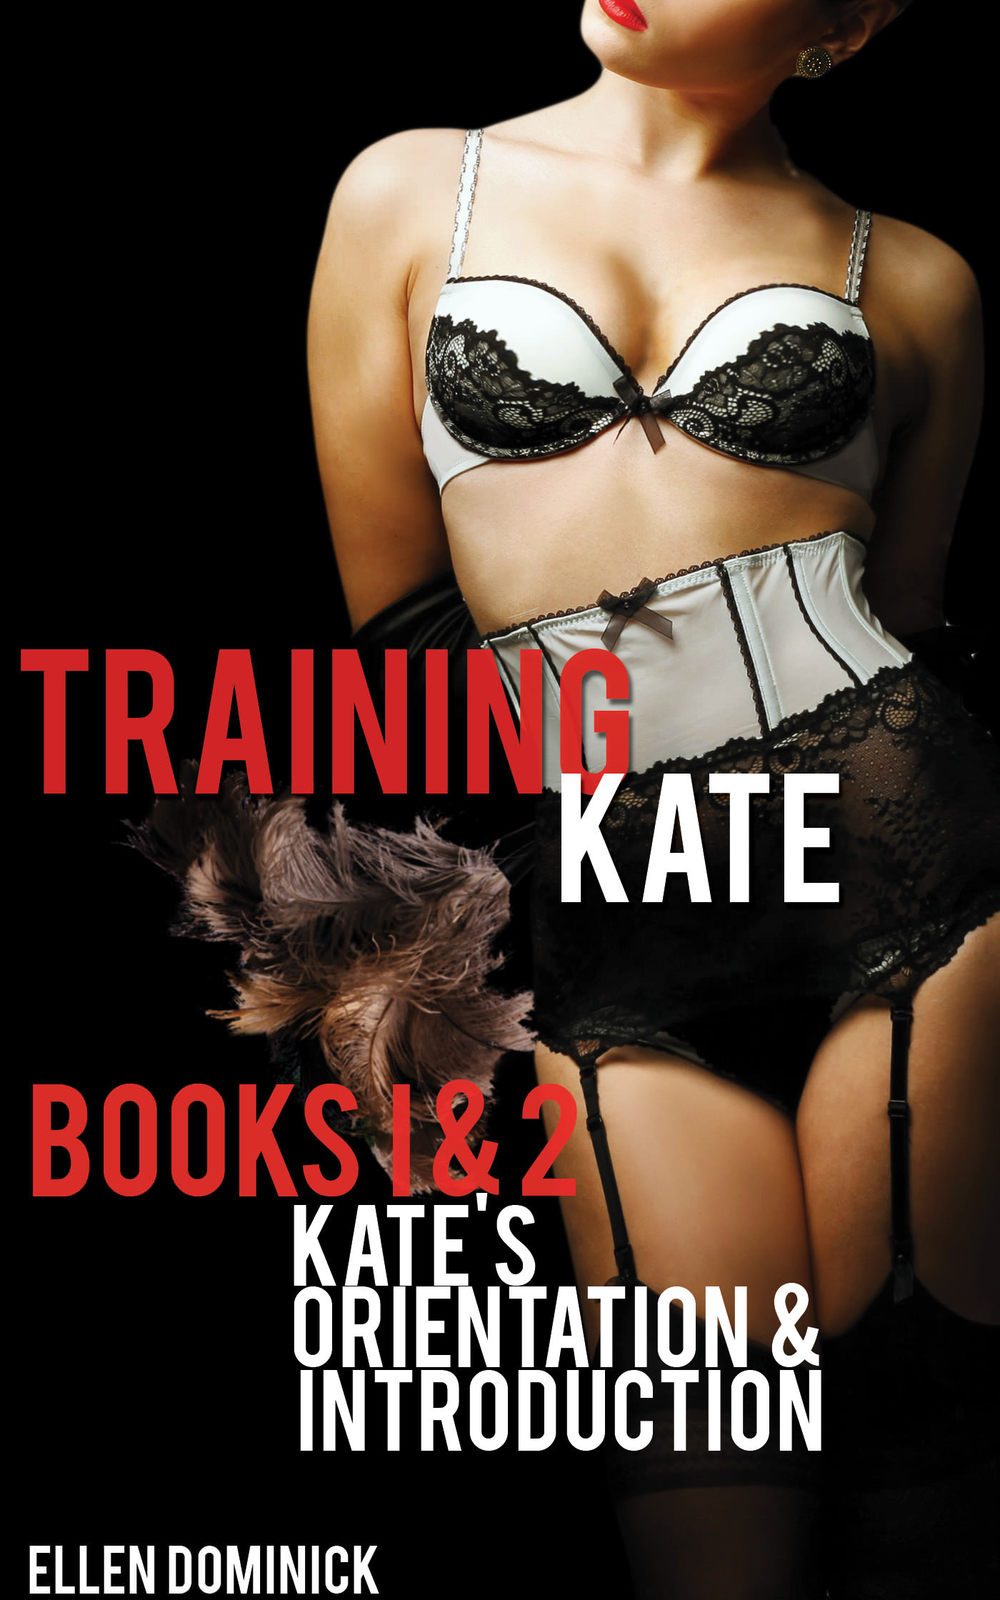 trainingkatebundle1-2.jpg